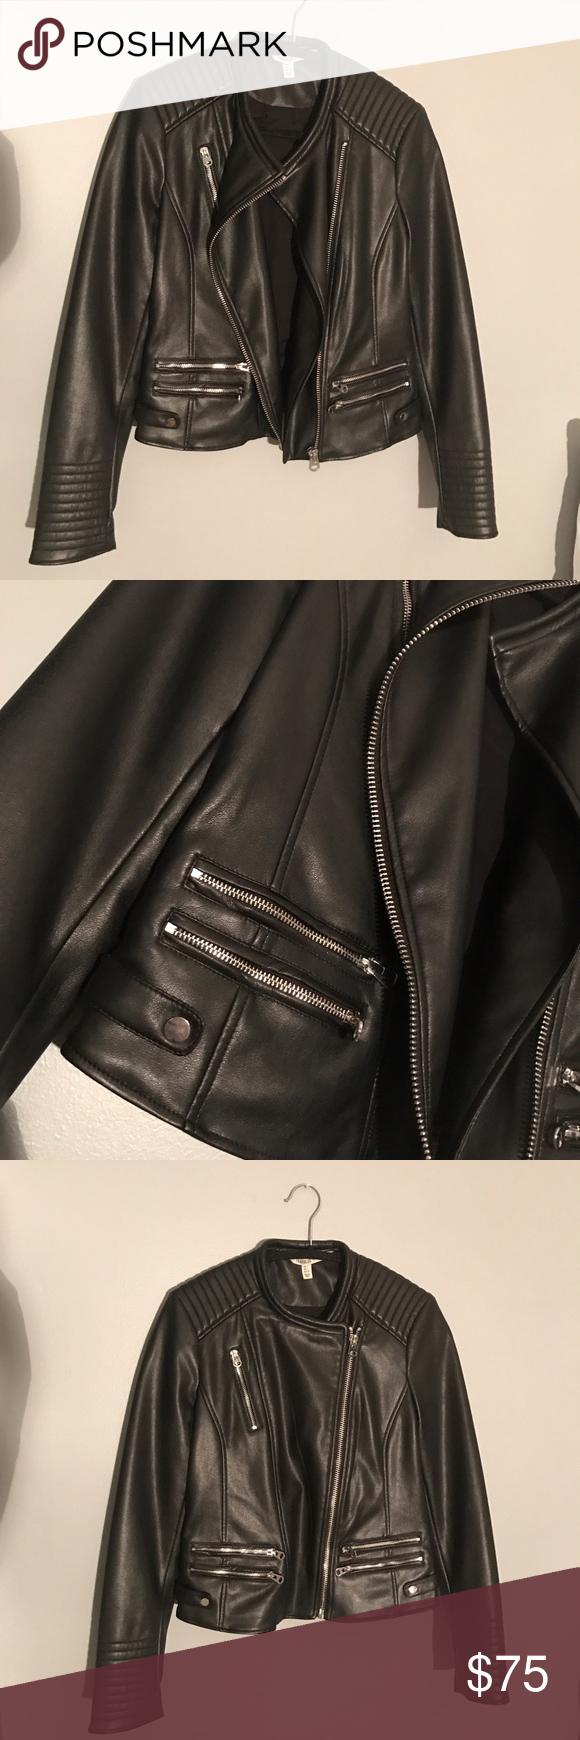 Leather jacket Brand new leather jacket! Silver hardware! Fits like a m/l Zara Jackets & Coats